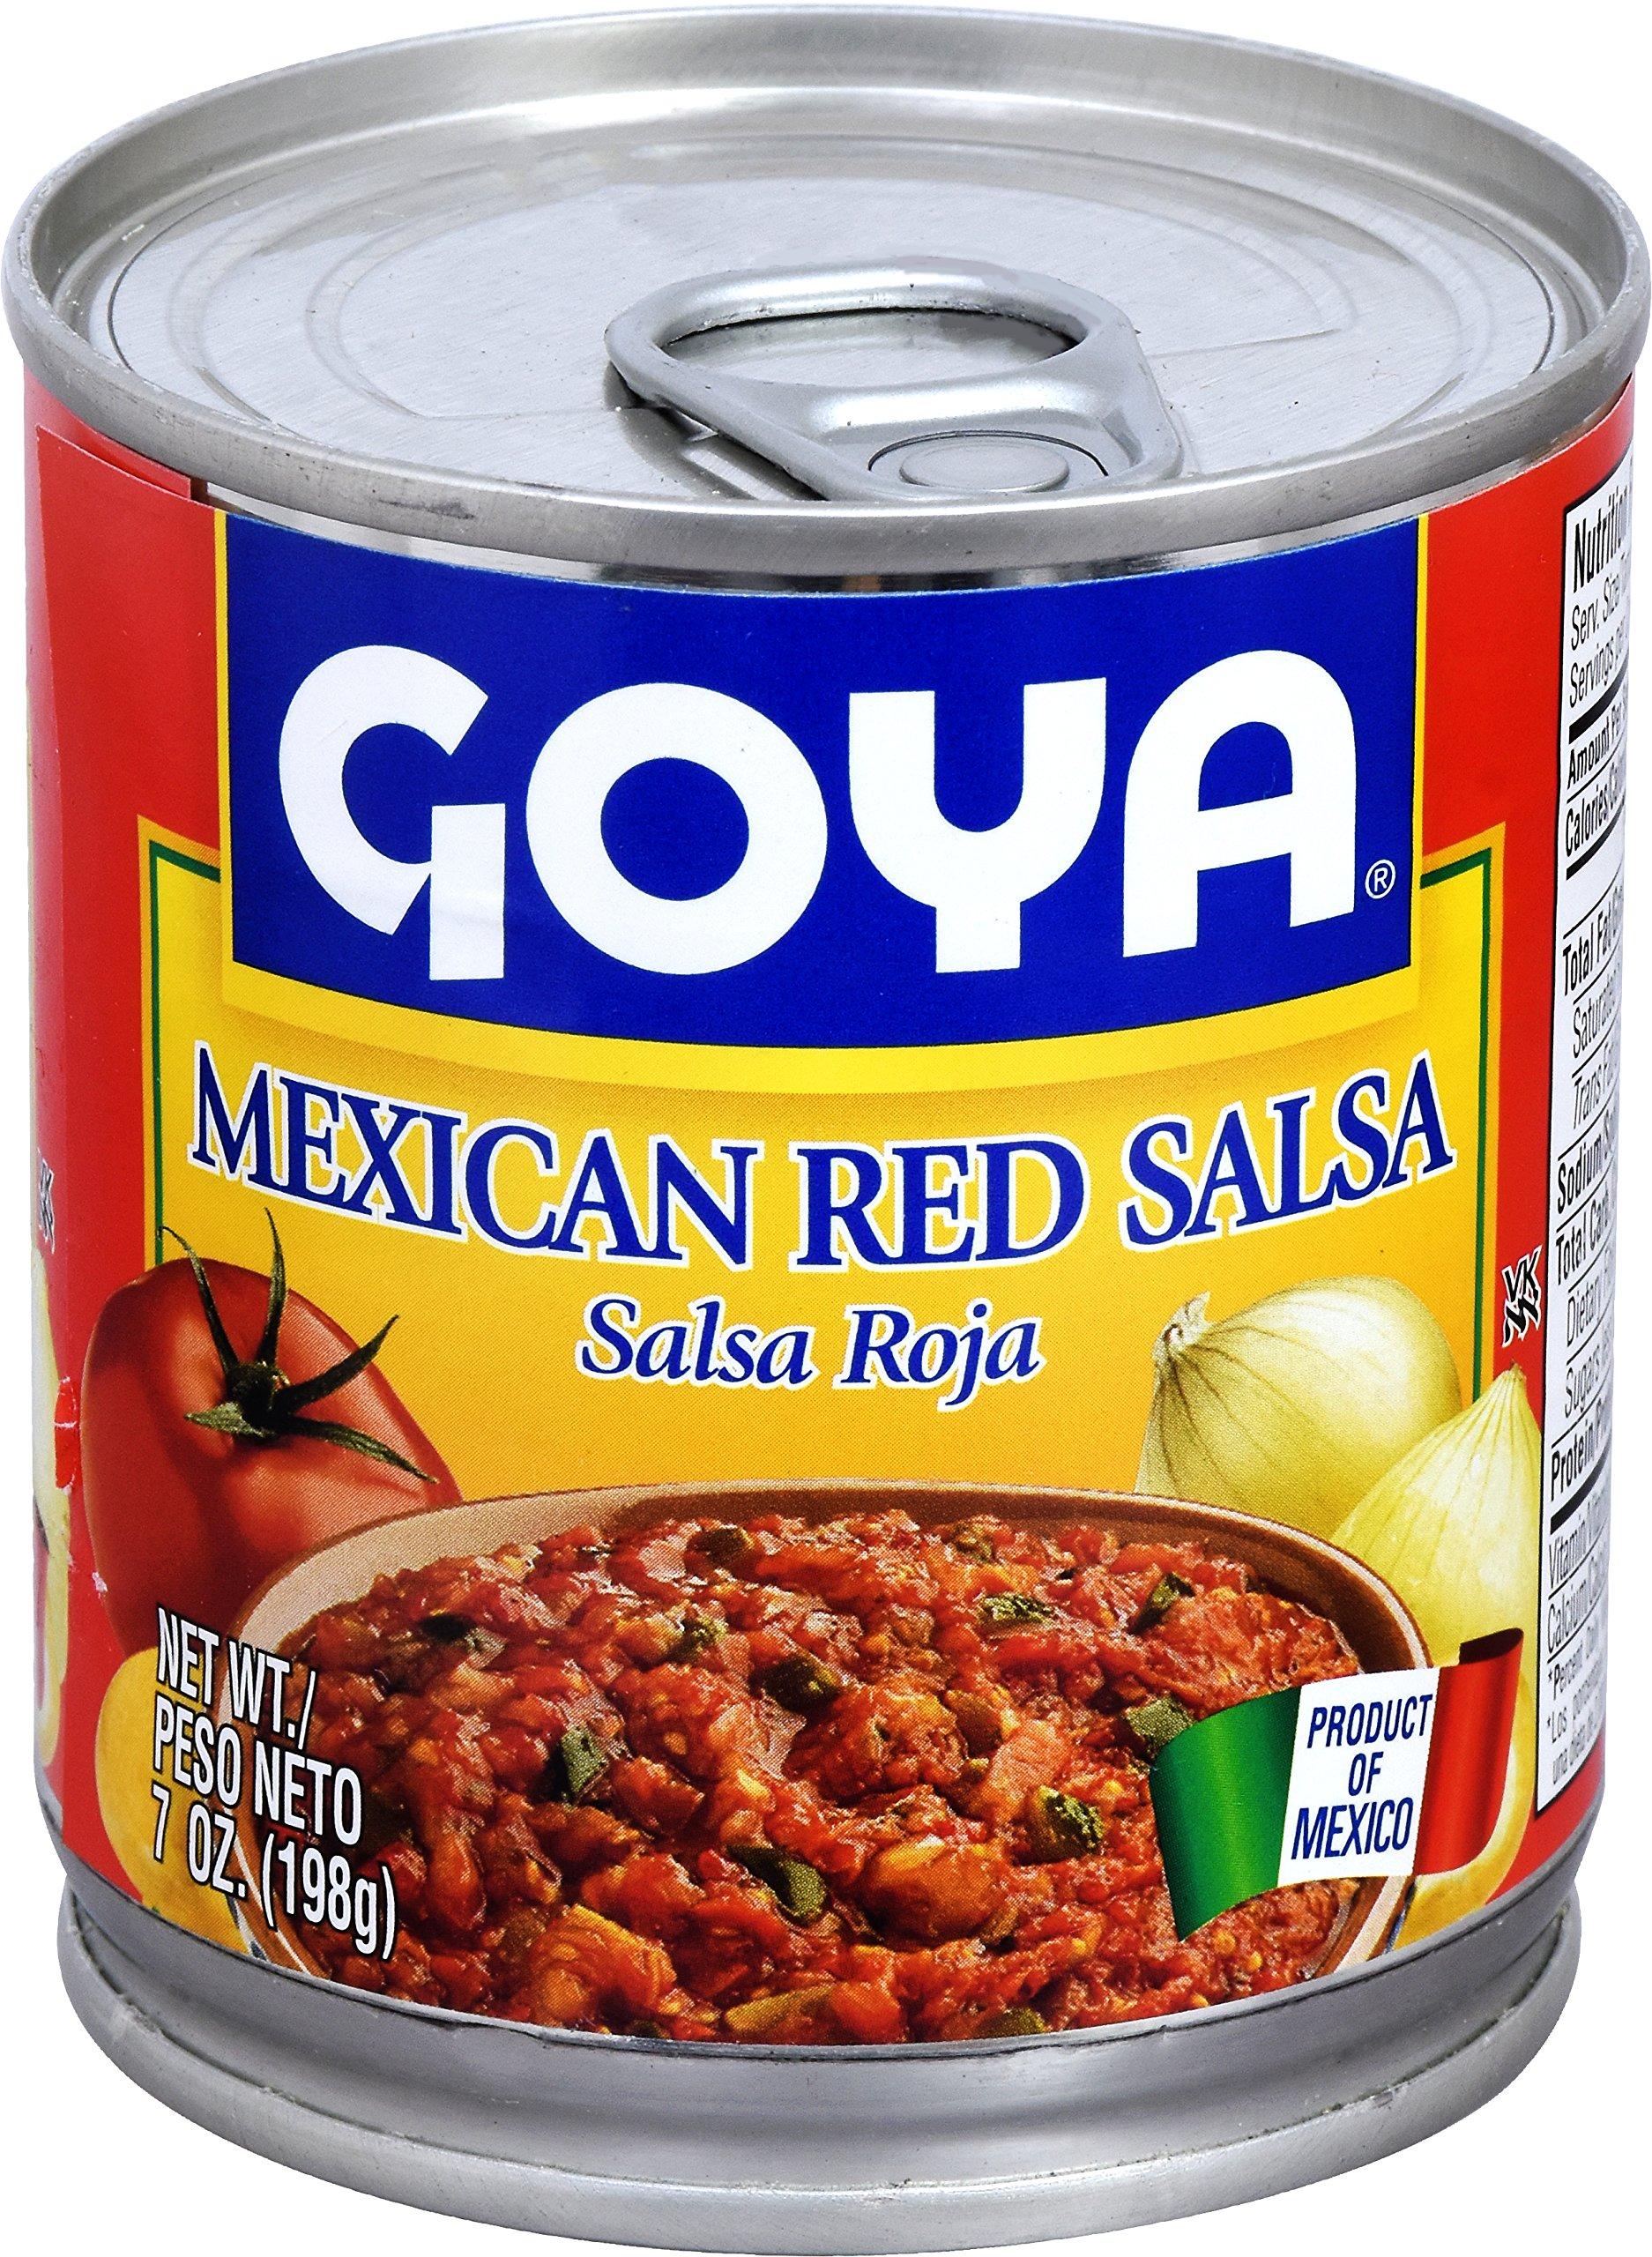 Goya Foods Salsa Roja Casera Mexican, 7-Ounce (Pack of 24)